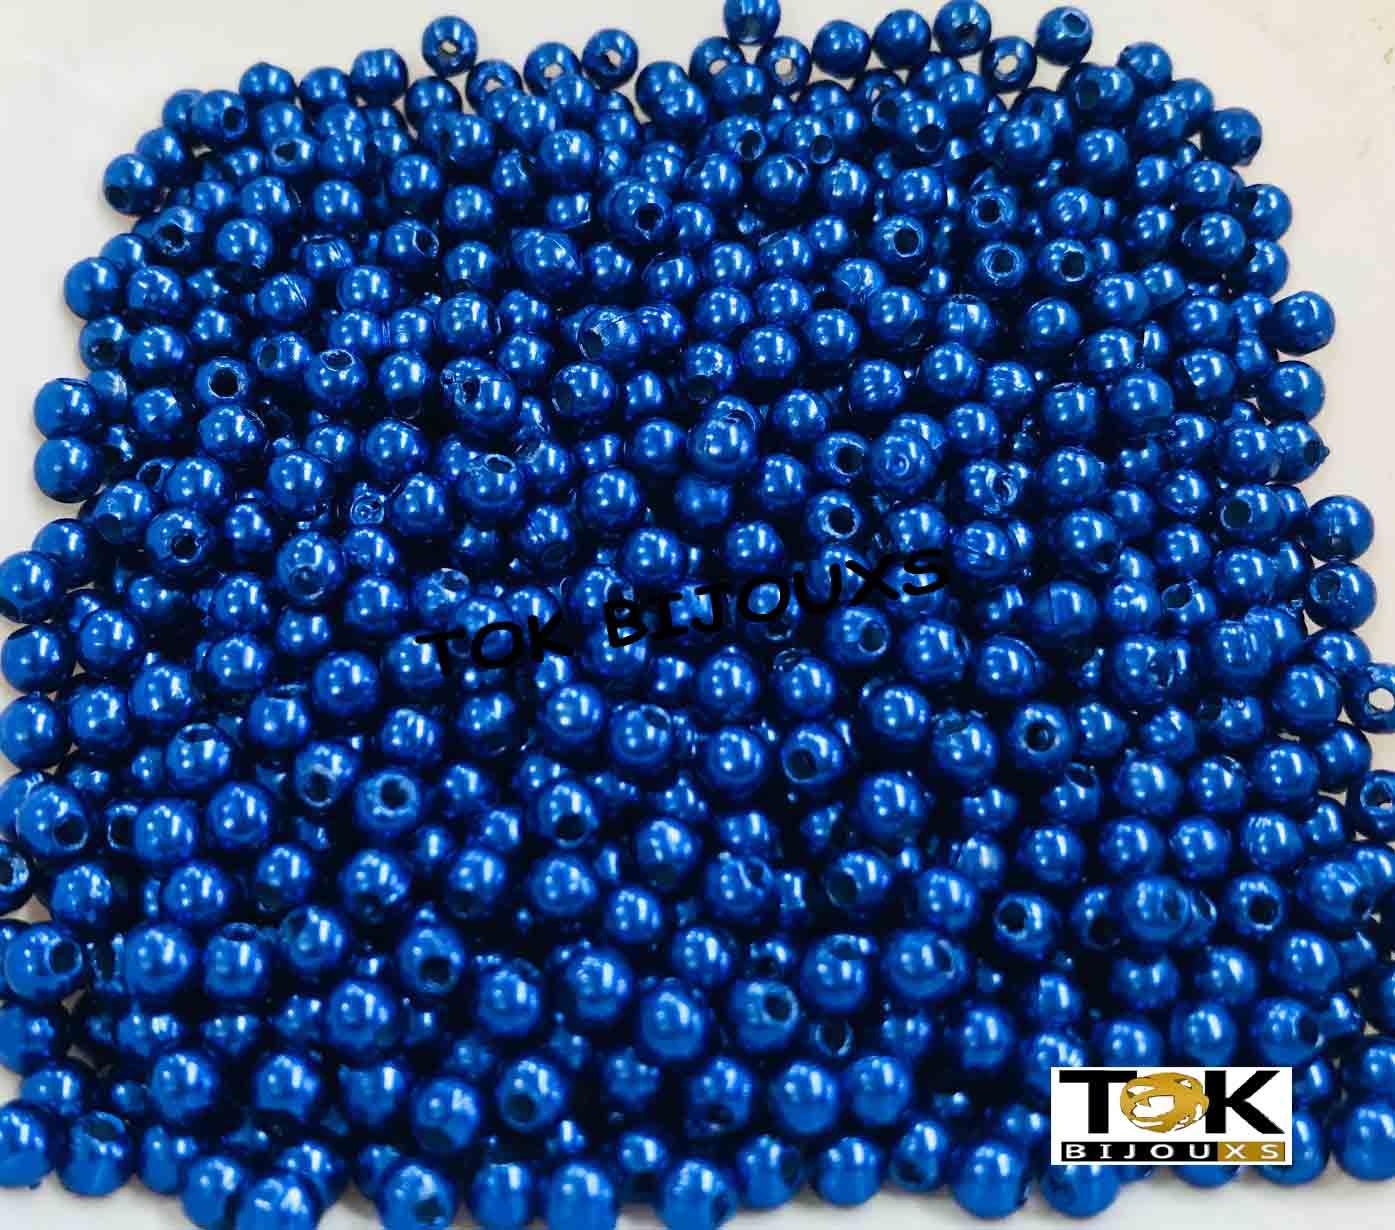 Pérola Abs 5mm - Azul Royal - 25g